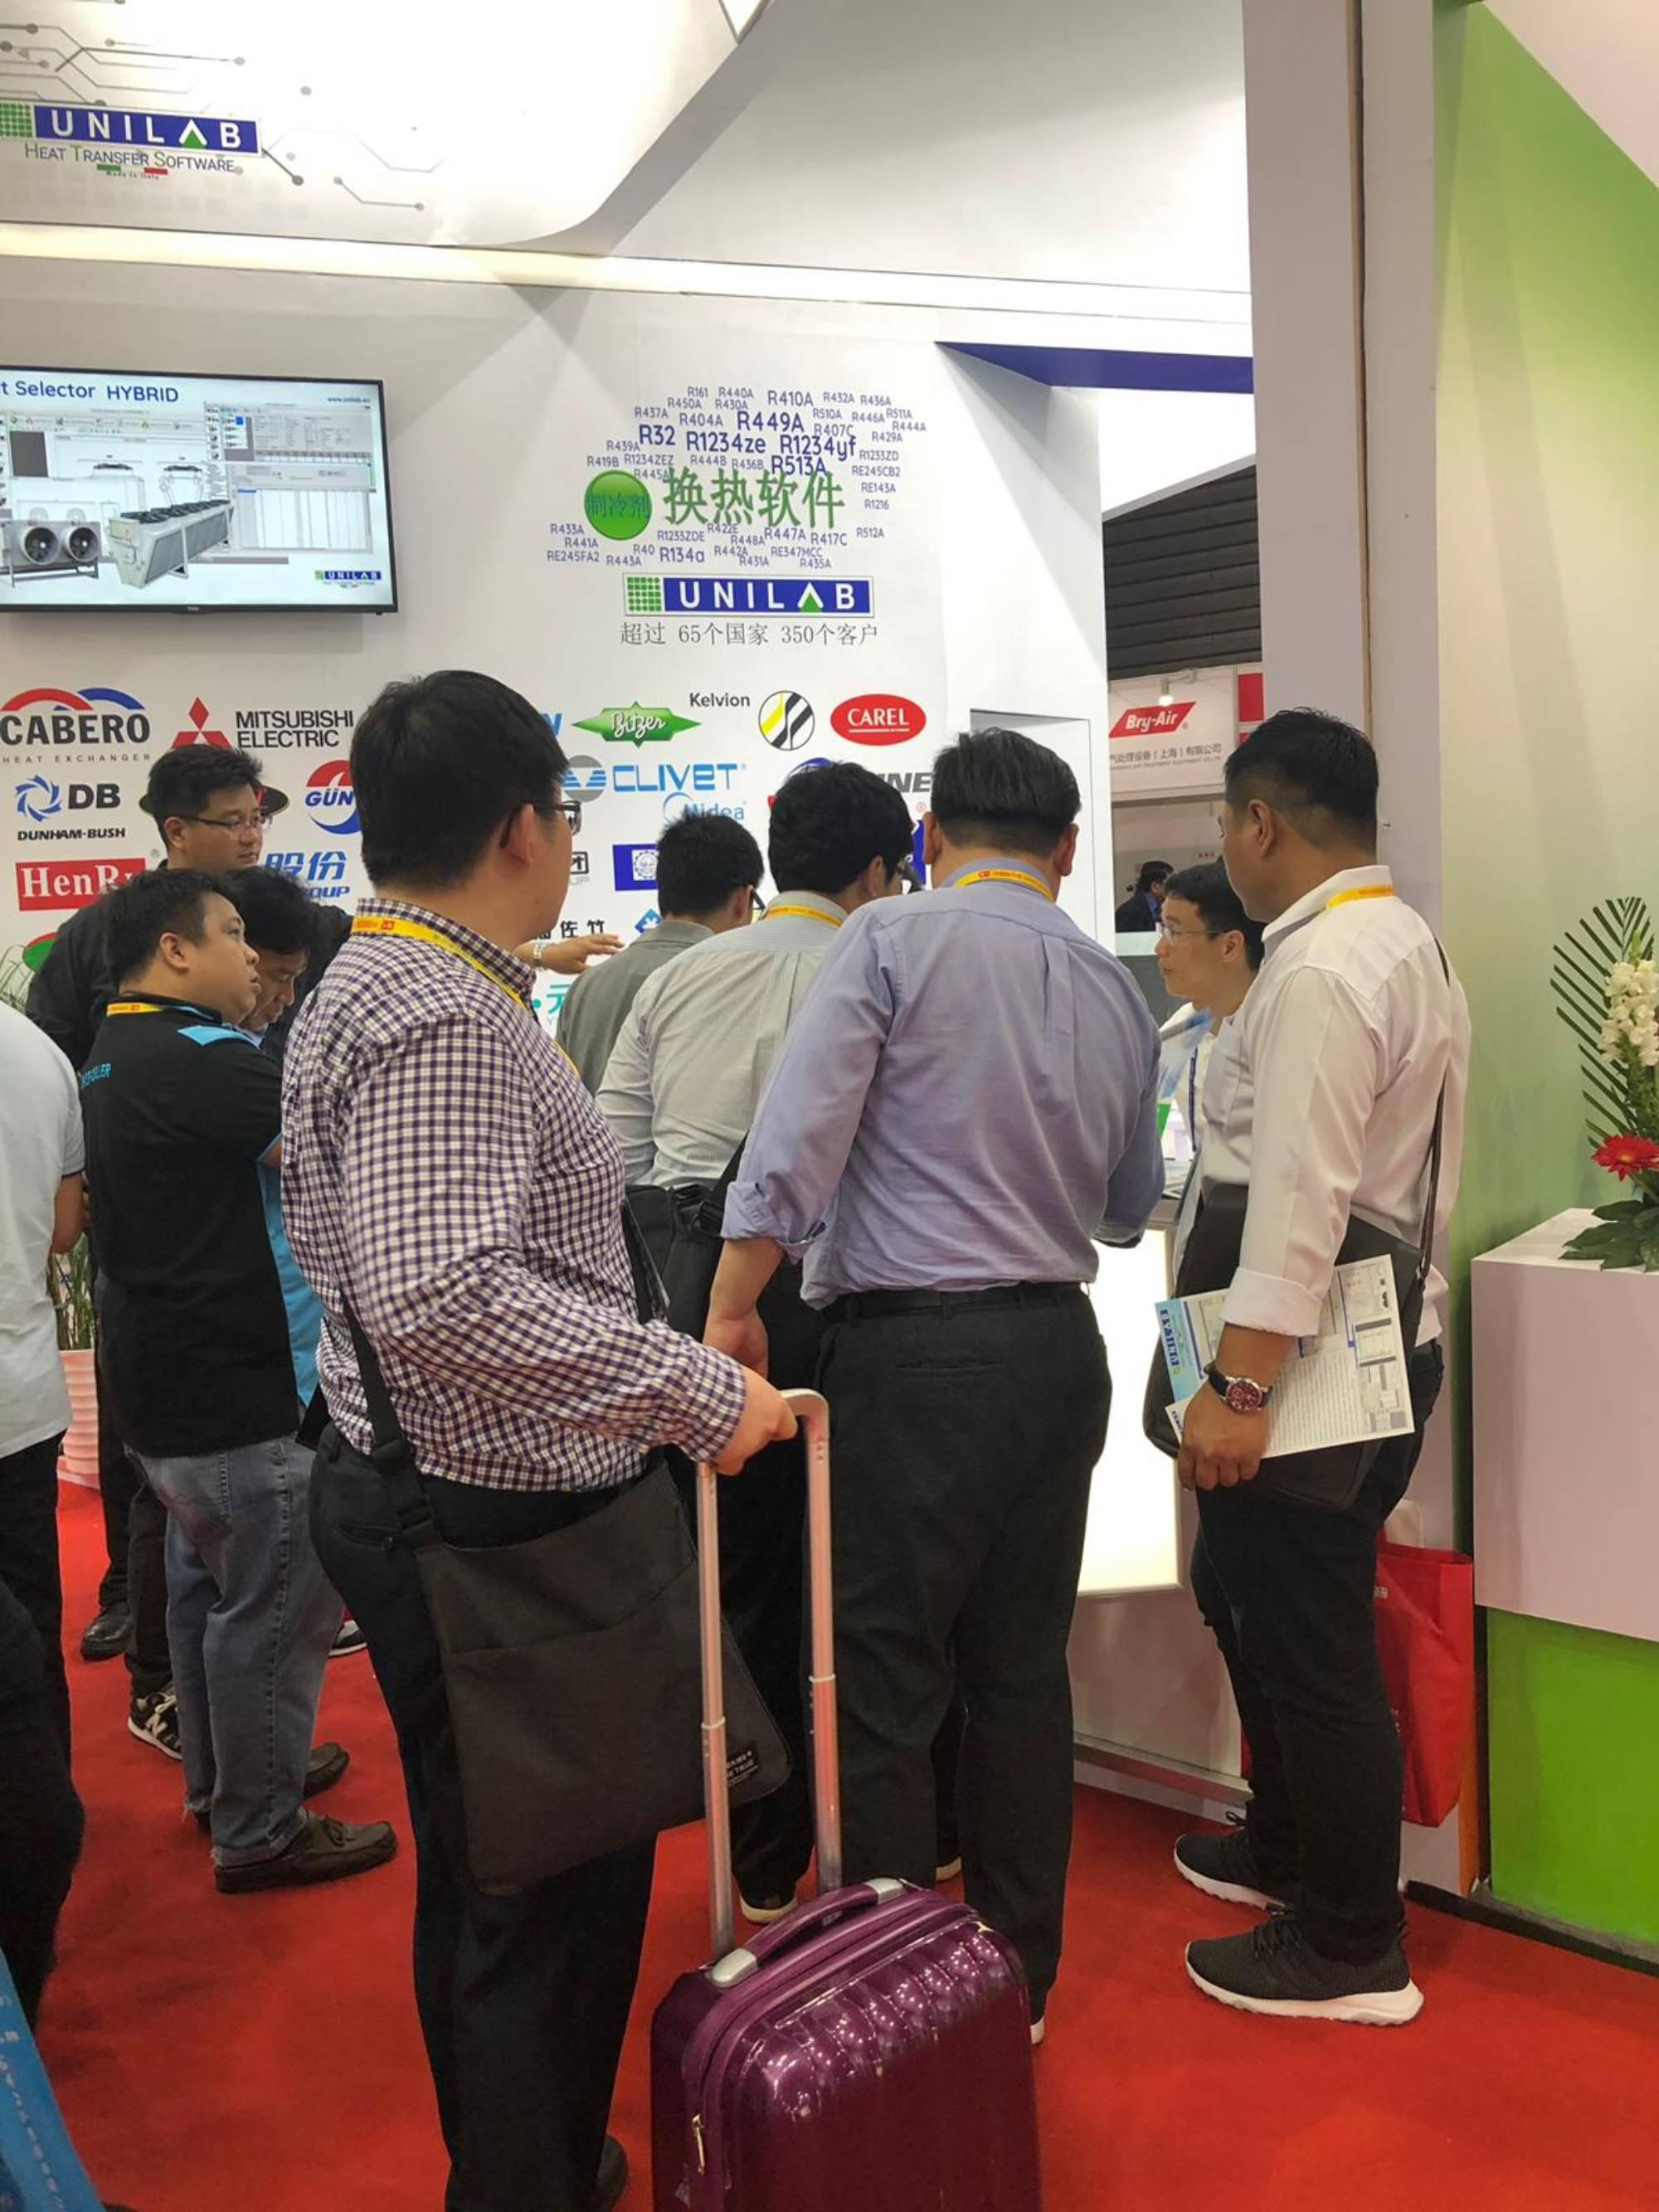 CHINA REFRIGERATION 2019: DAY 1 | UNILAB - Heat Transfer Software